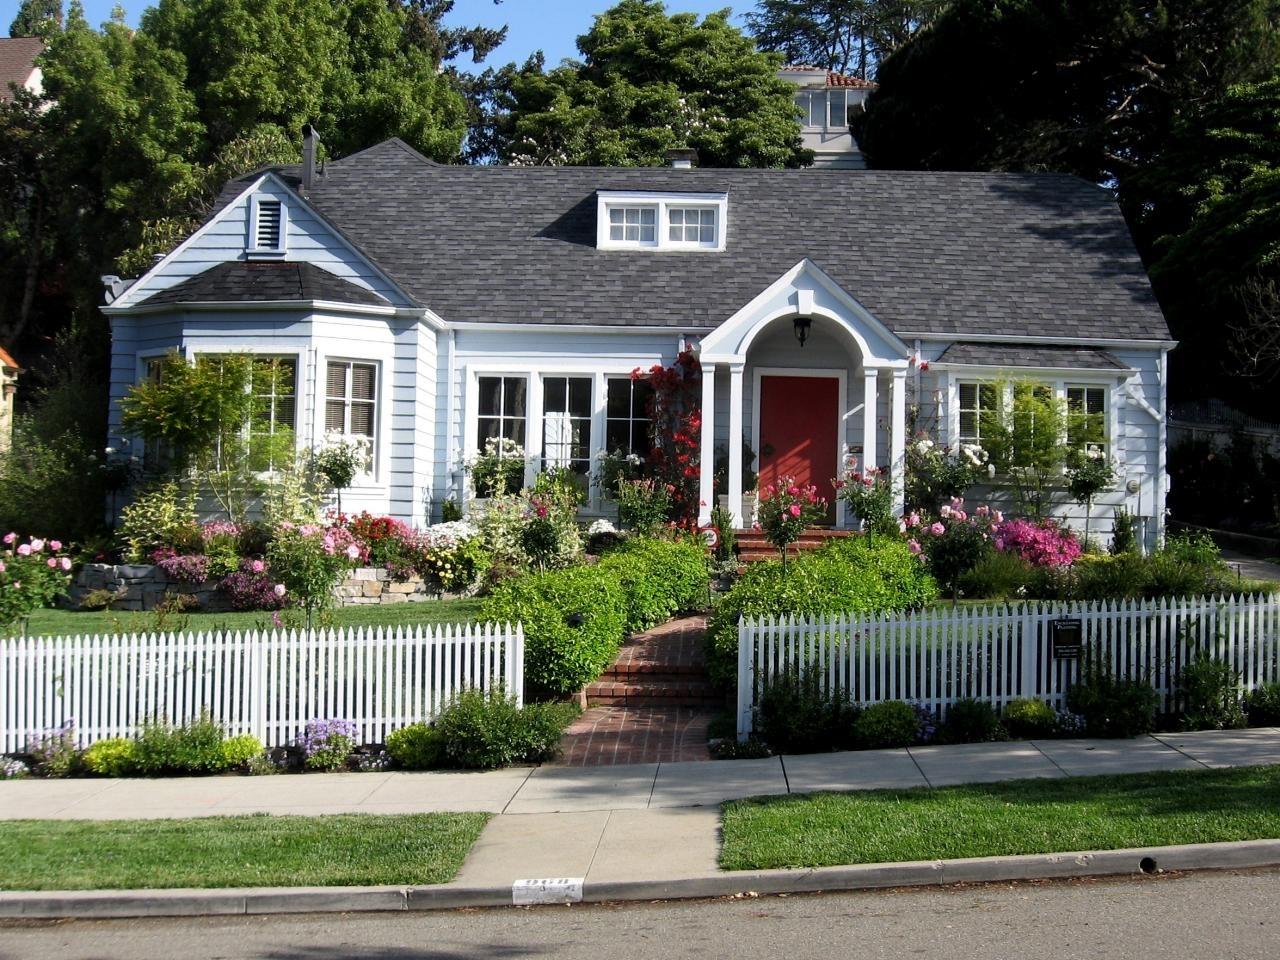 10 Fantastic Cottage Landscaping Ideas For Front Yard %name